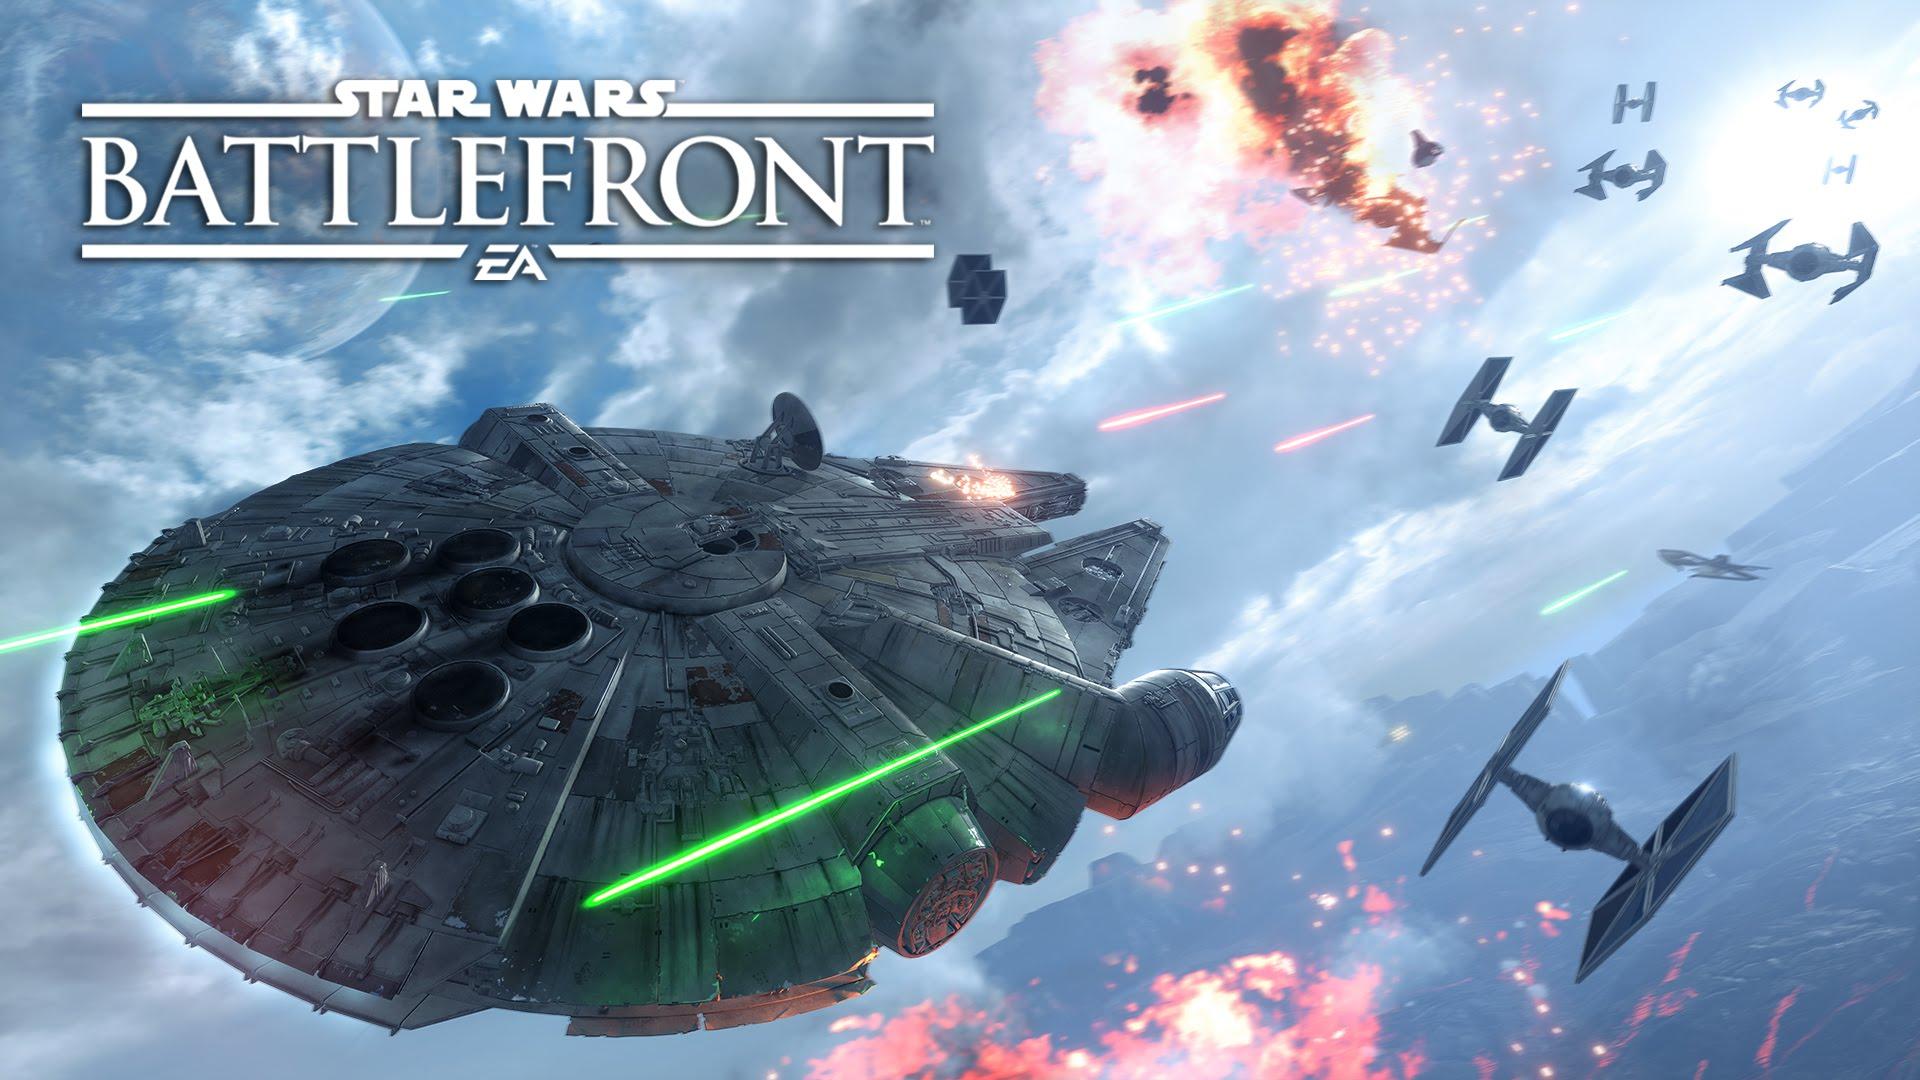 Star Wars Battlefront is Live, Let's Play!